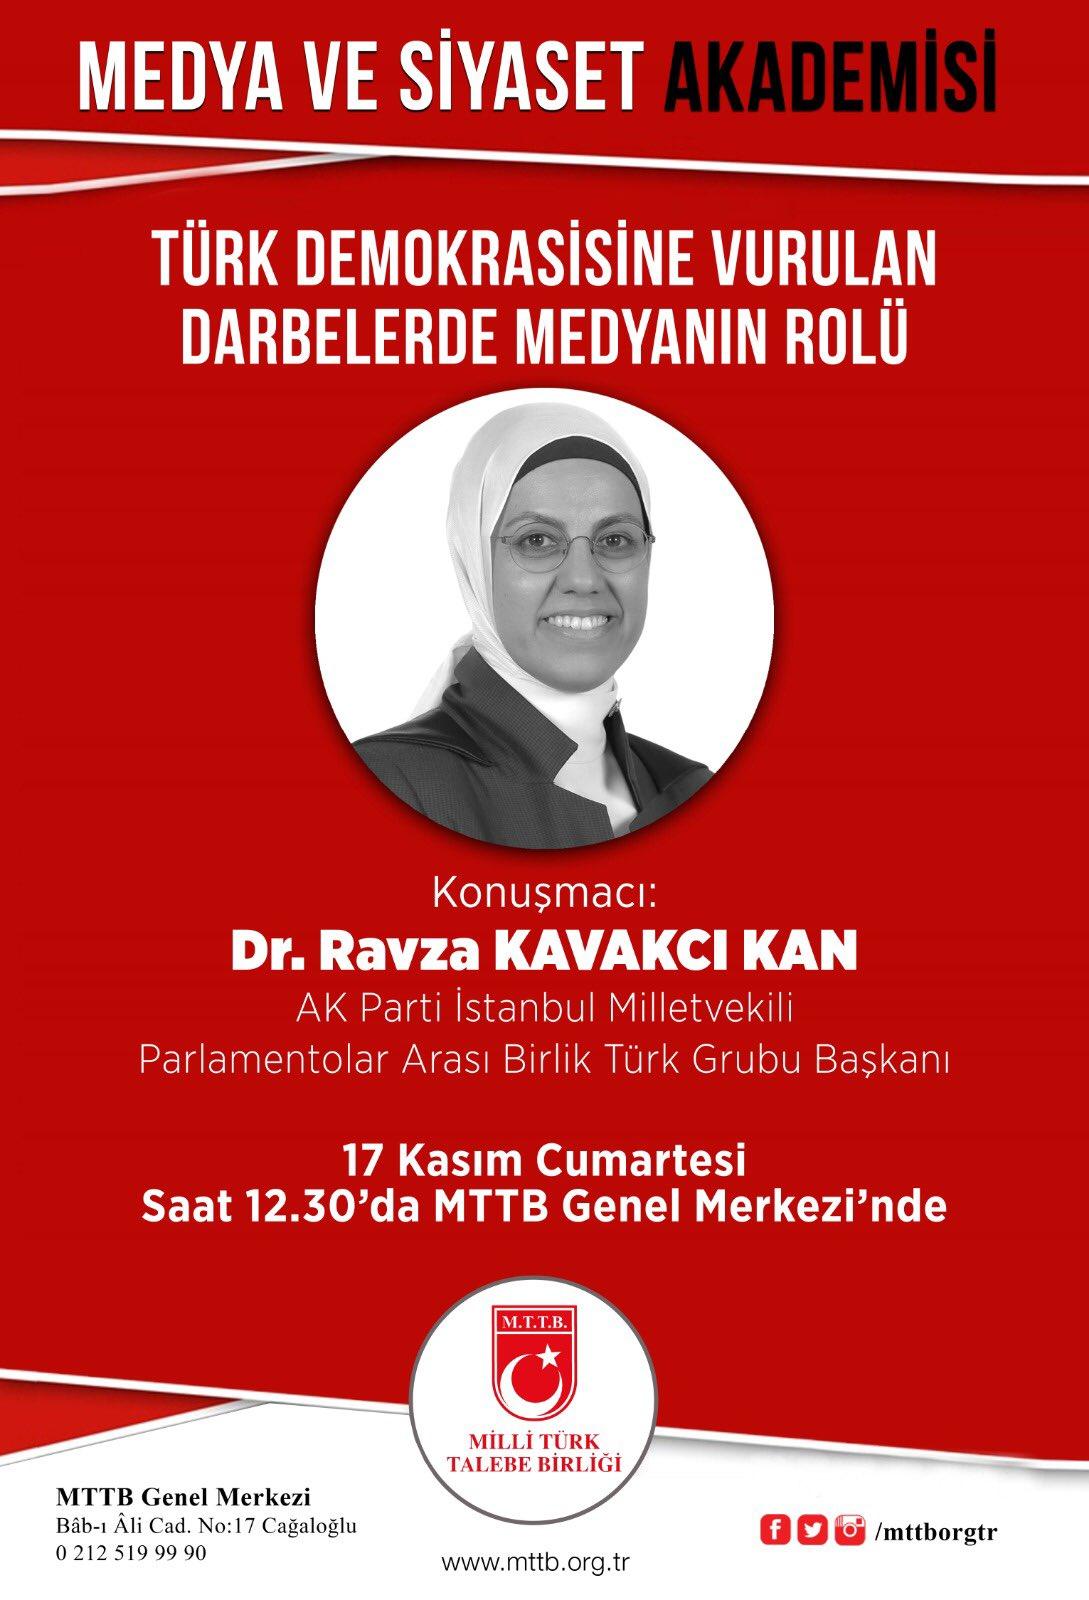 MEDYA VE SİYASET AKADEMİSİ 2. HAFTA